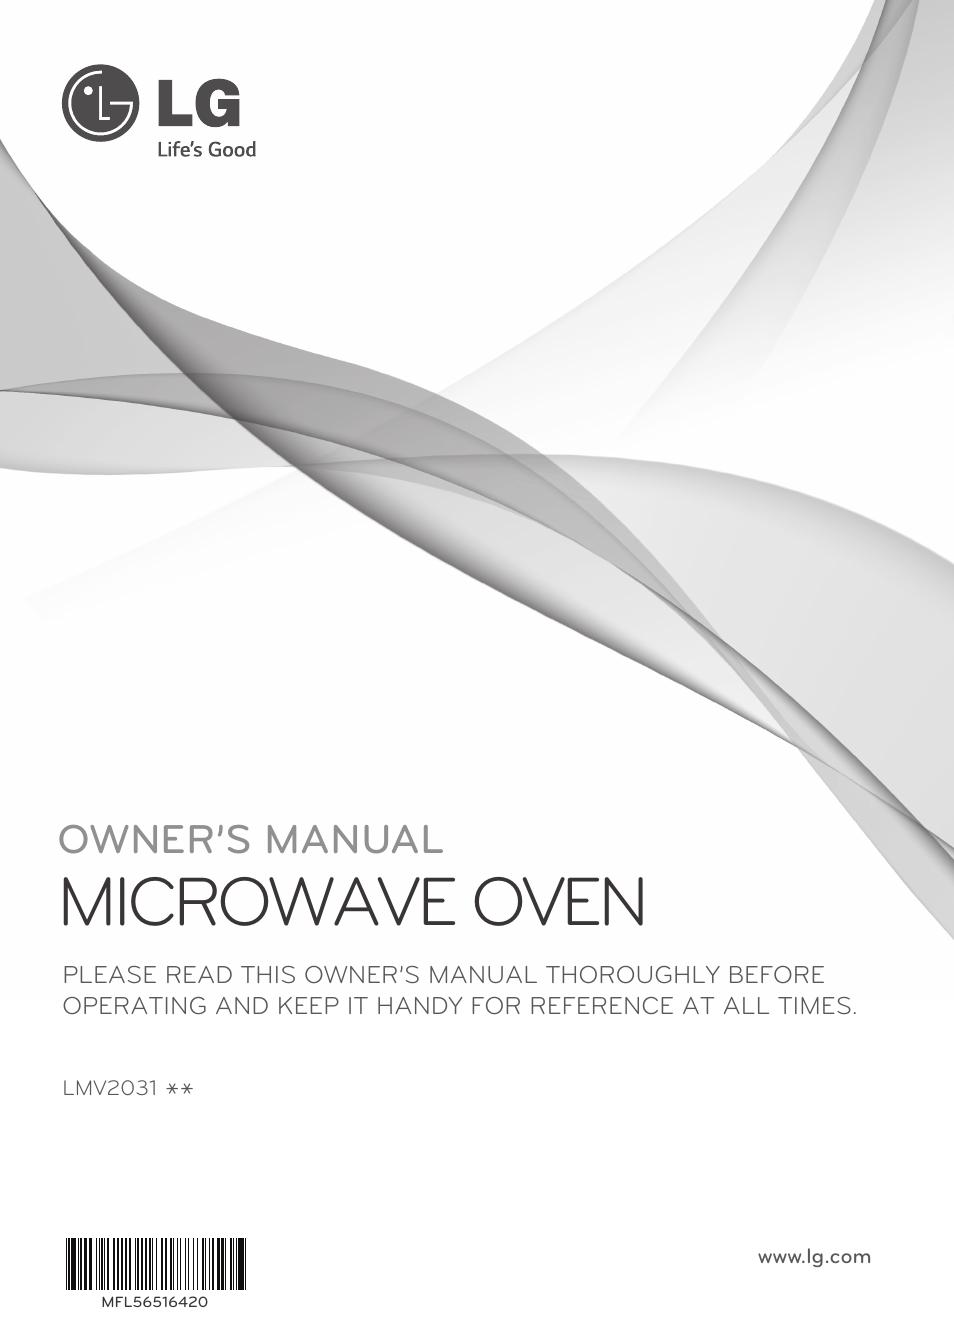 lg lmv2031sb user manual 32 pages also for lmv2031st lmv2031sw rh manualsdir com lg oven user manual lg microwave oven user manual